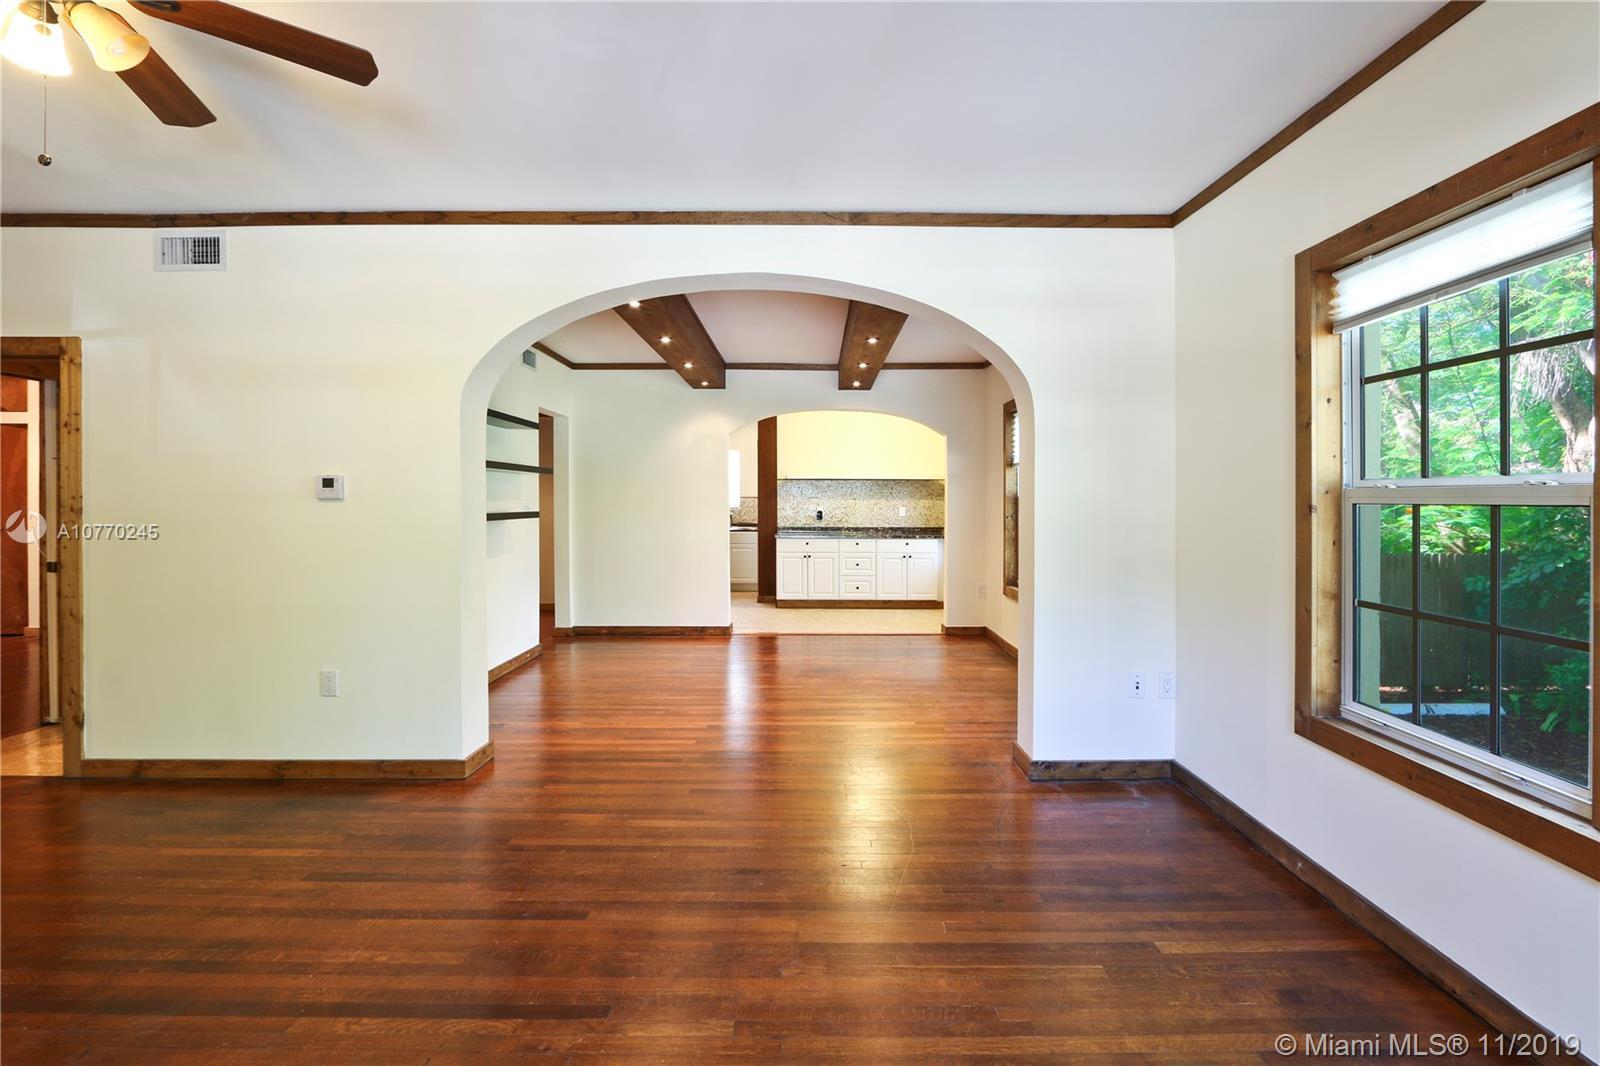 /  5000 sq. ft. $ 2019-11-08 0 Photo